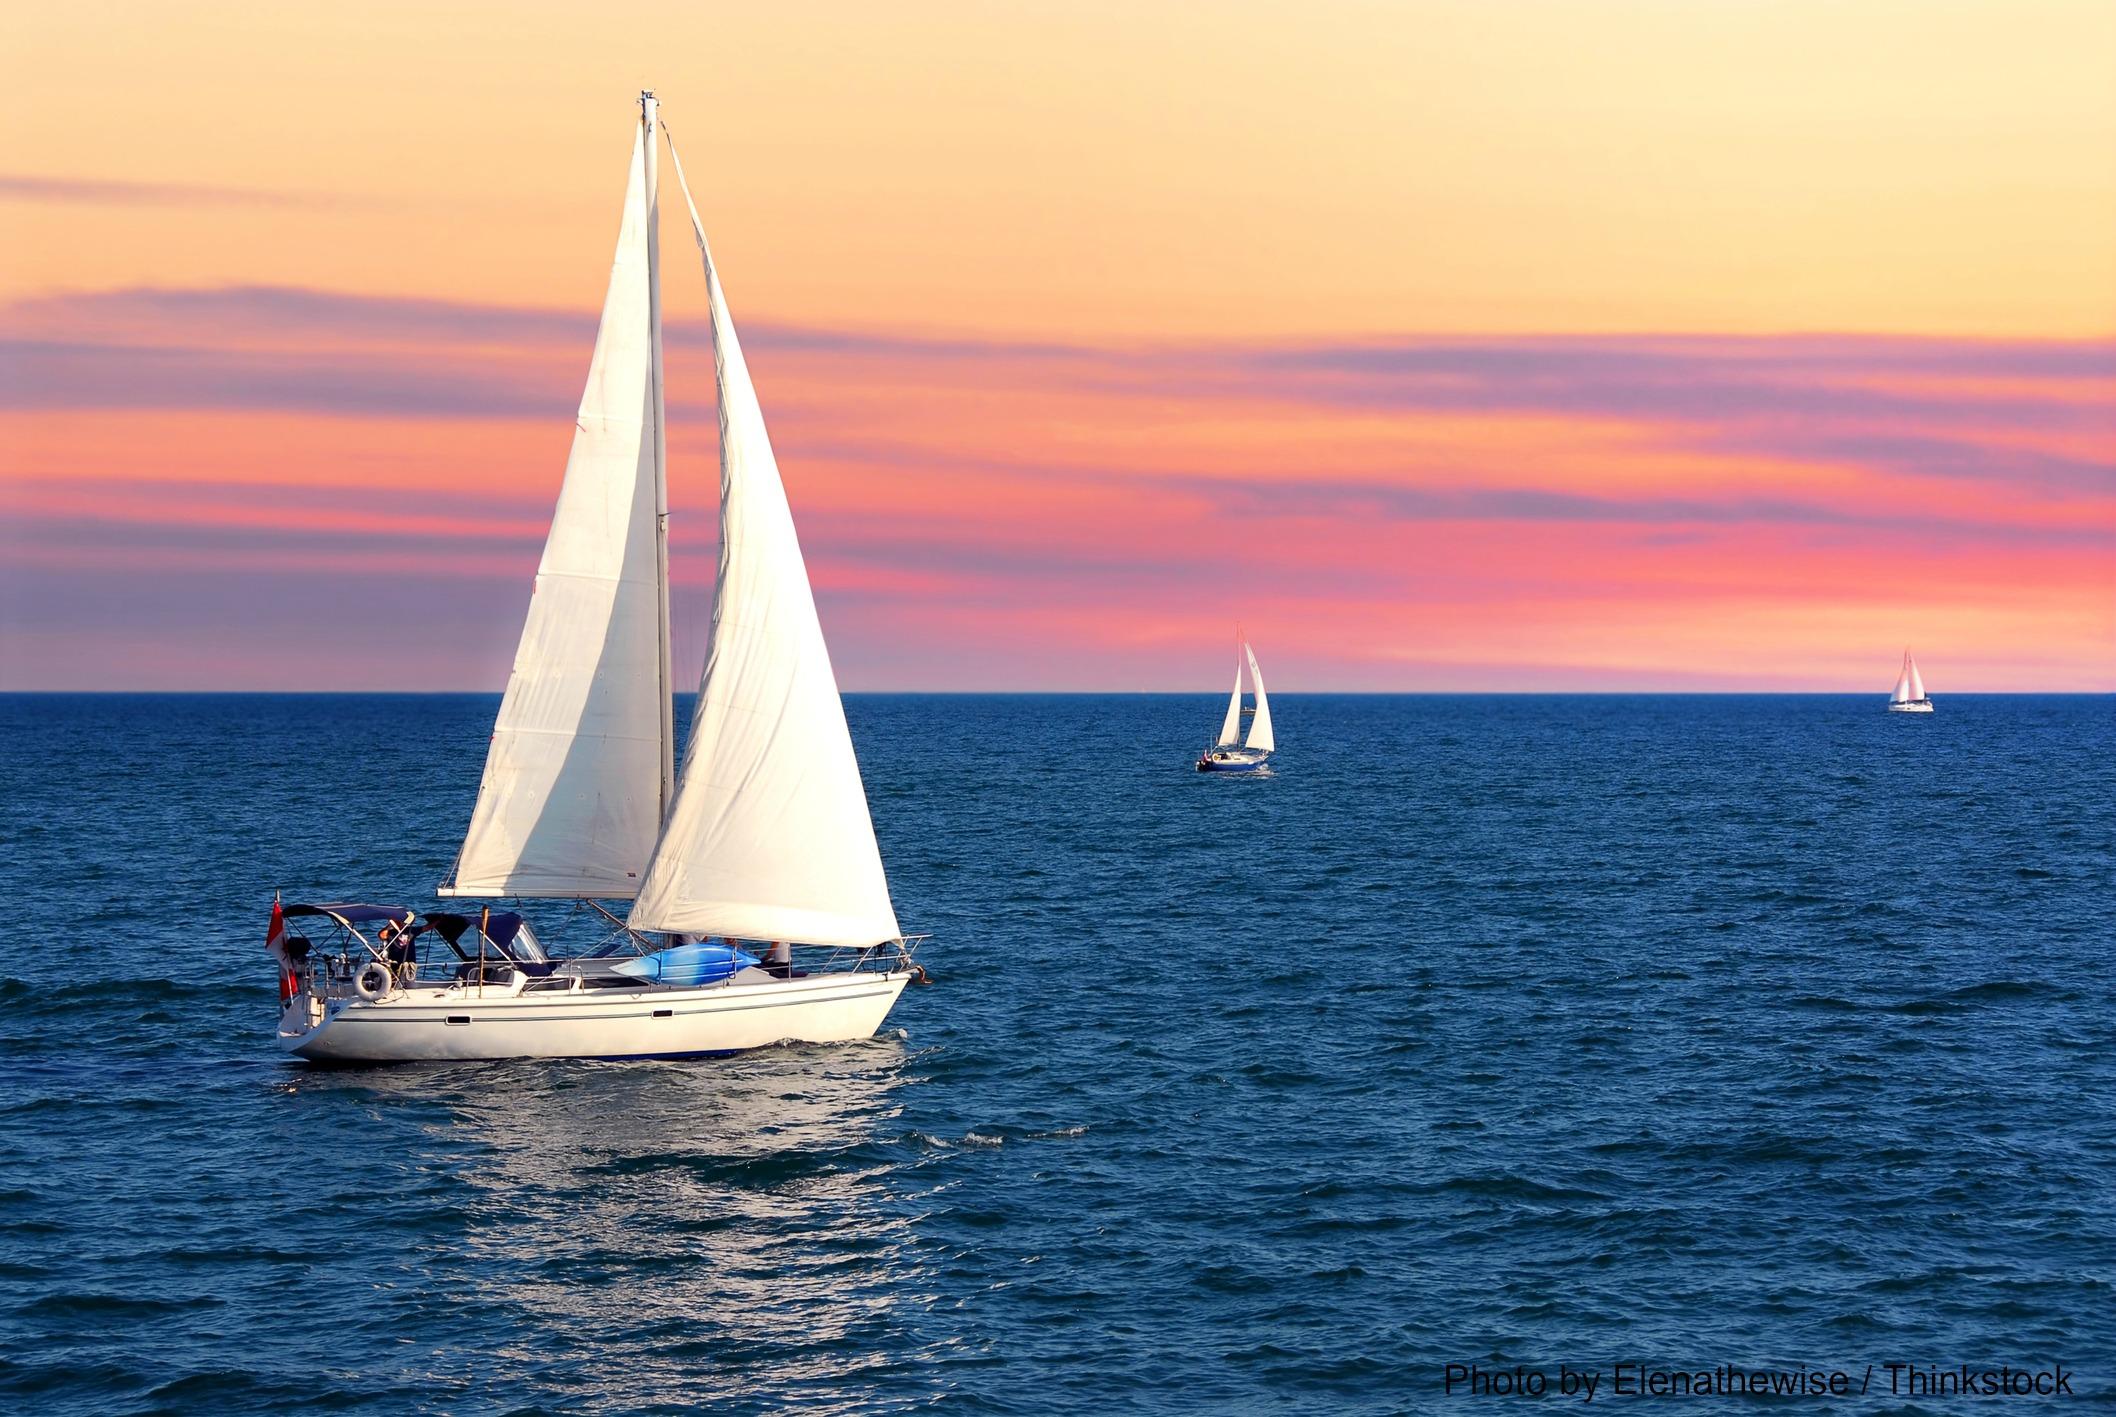 Sunset sailing in North Carolina